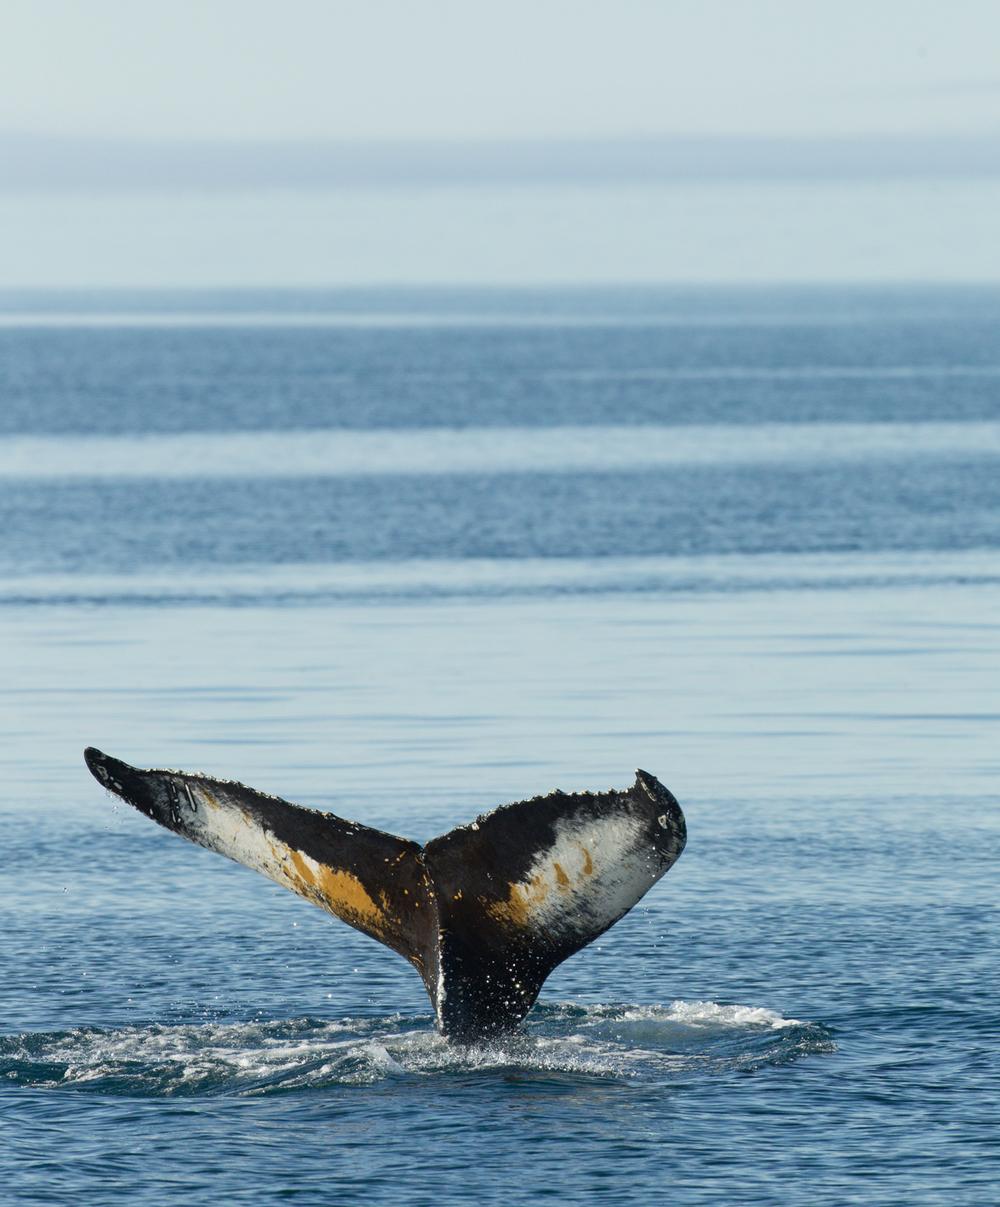 Humpback Whale, Hinlopen Stretet, July 2012